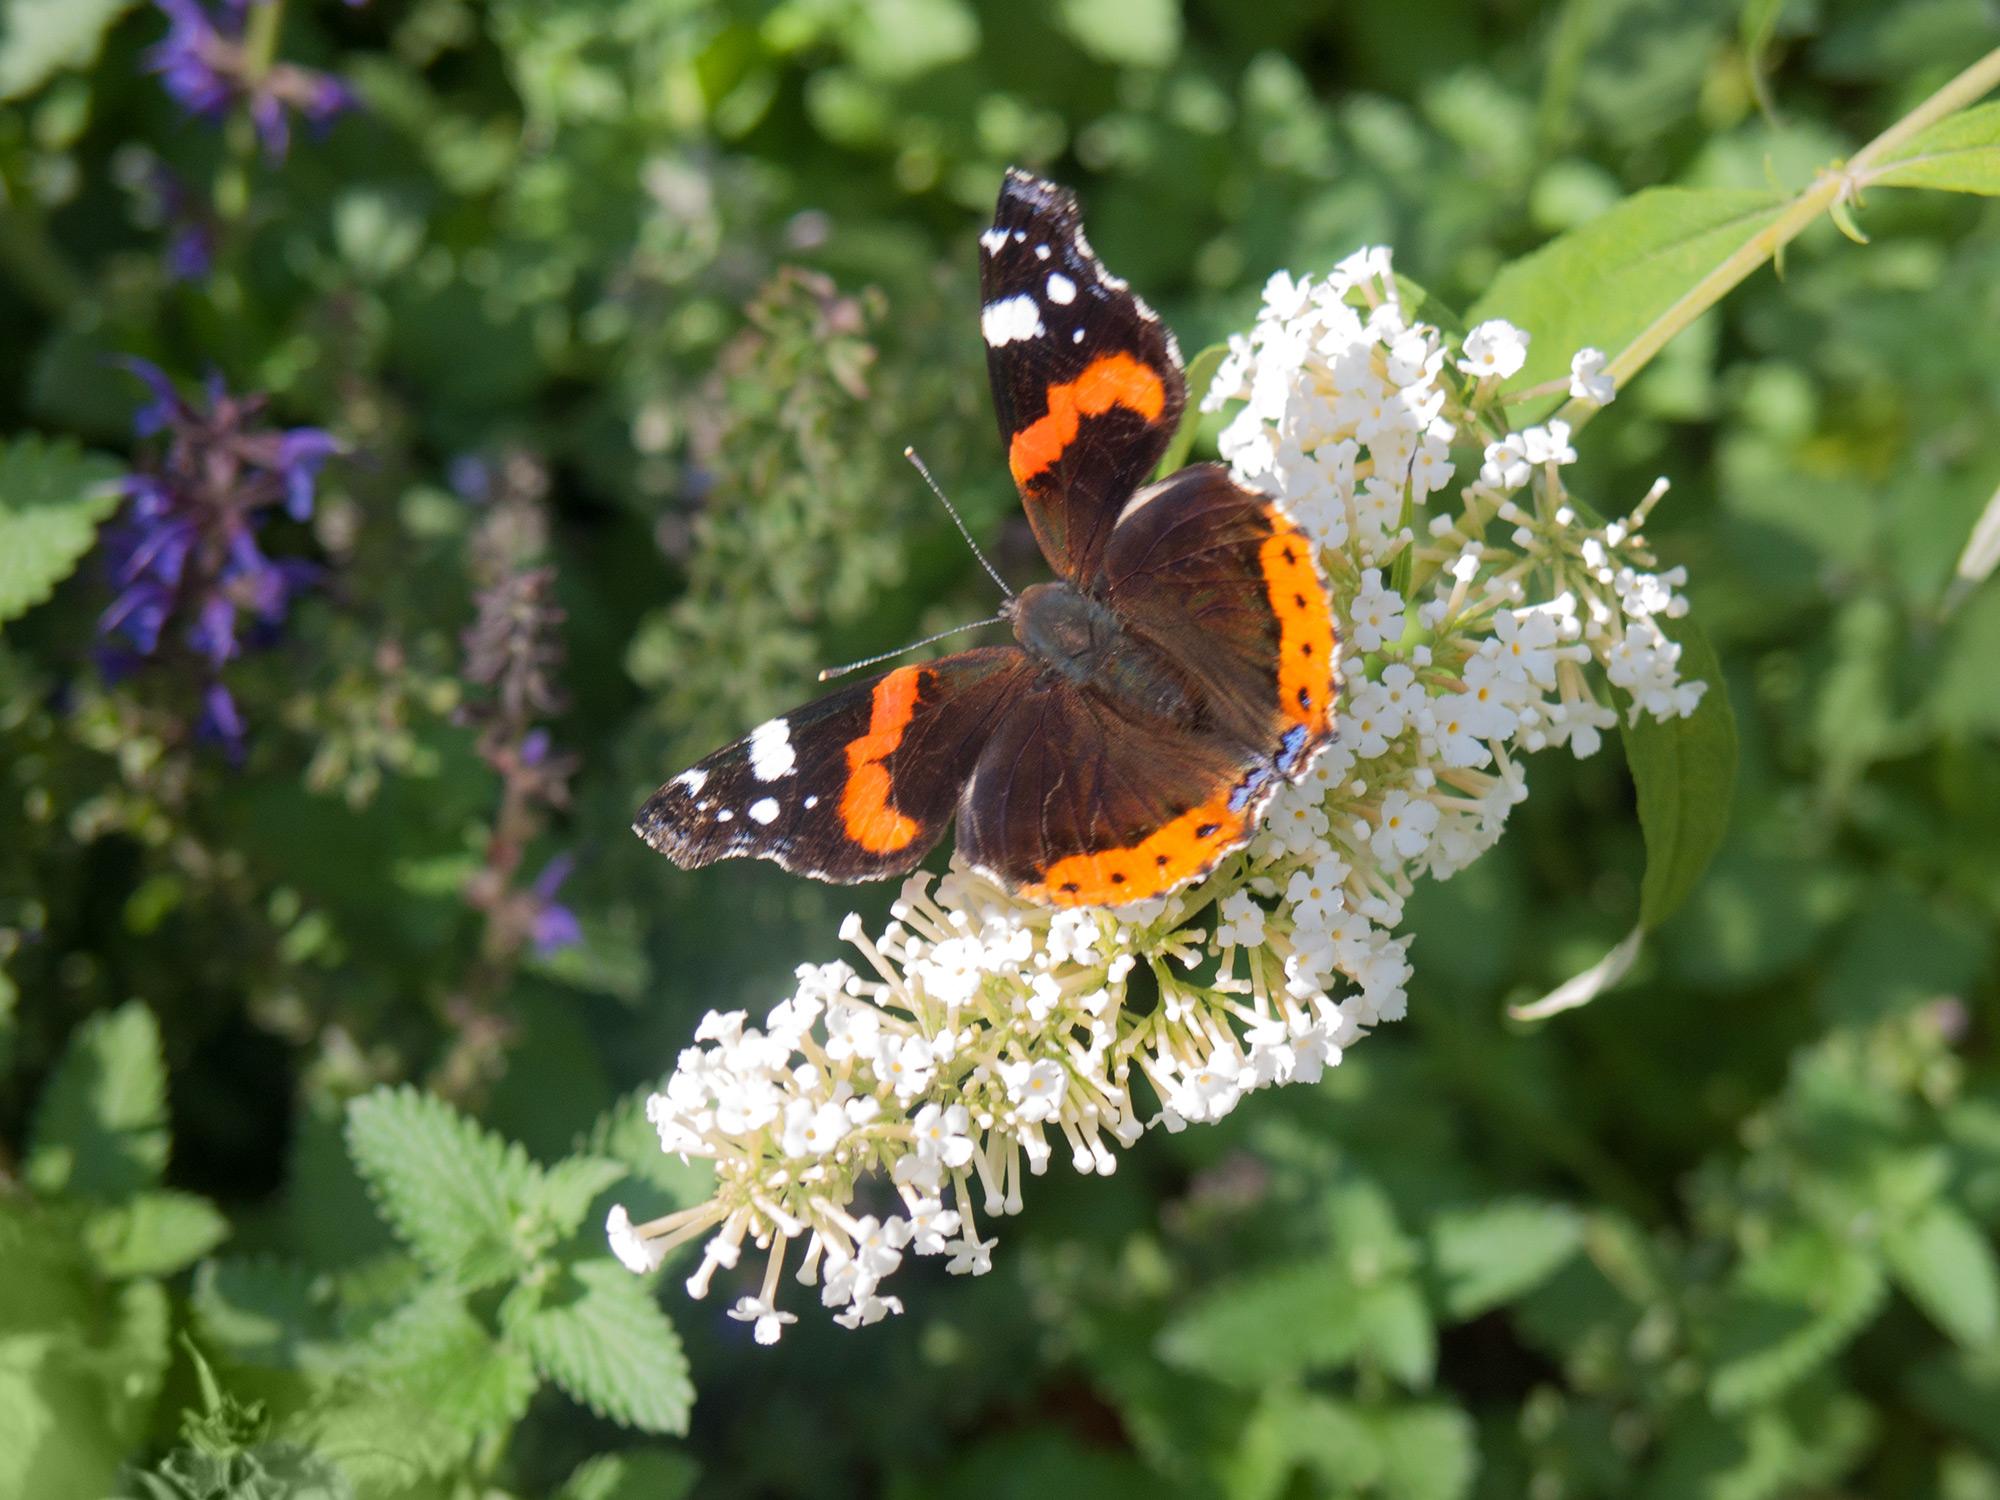 Бабочка-адмирал на цветке